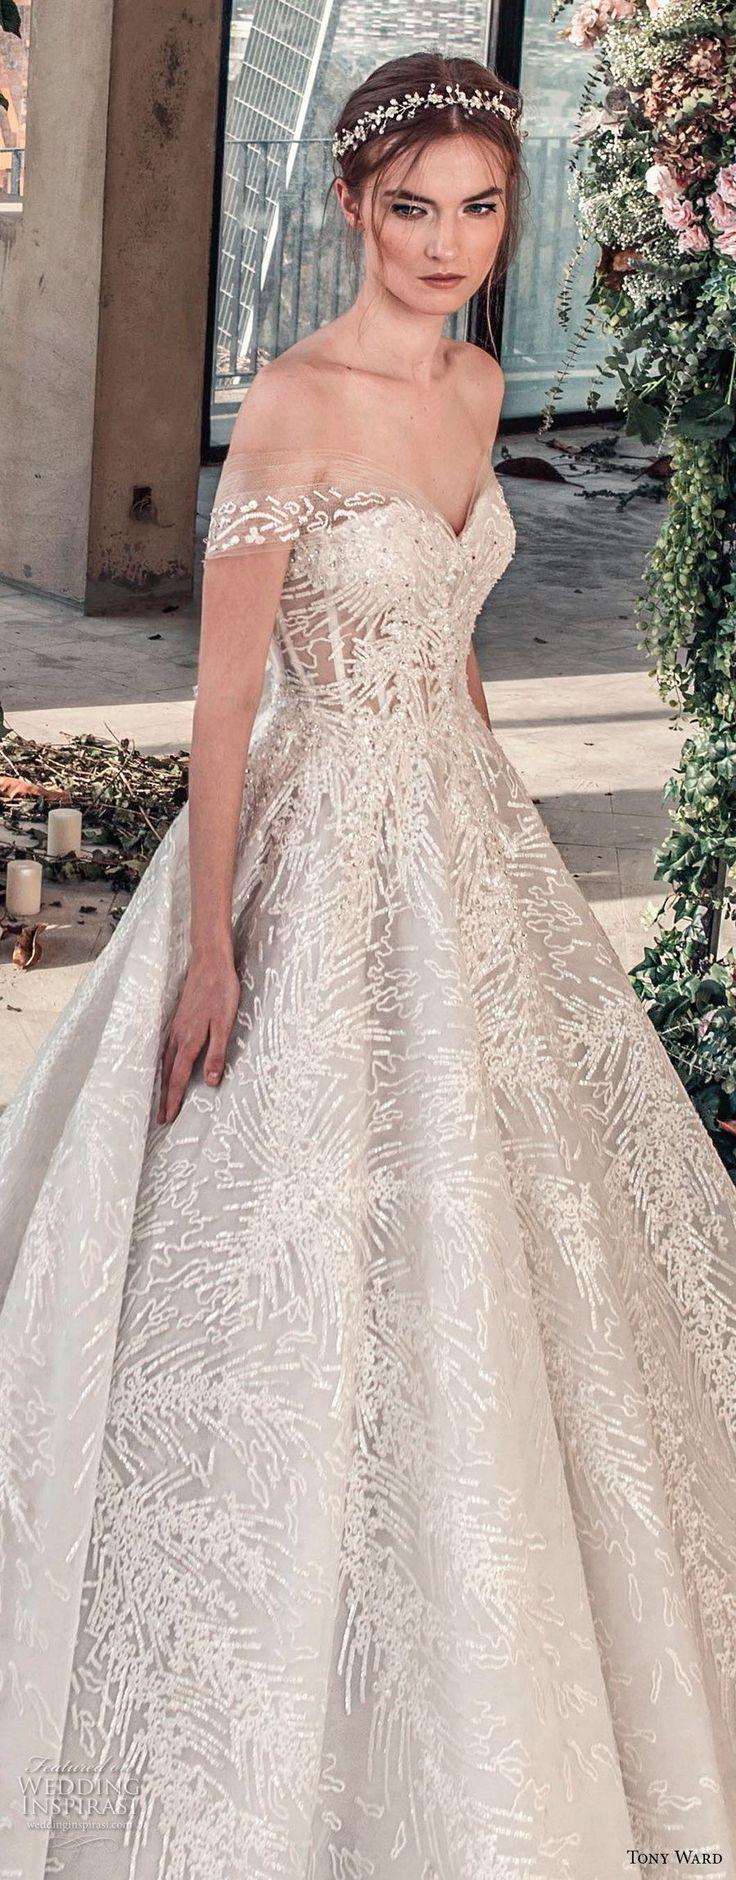 1696 best Wedding Dresses images on Pinterest   Homecoming dresses ...